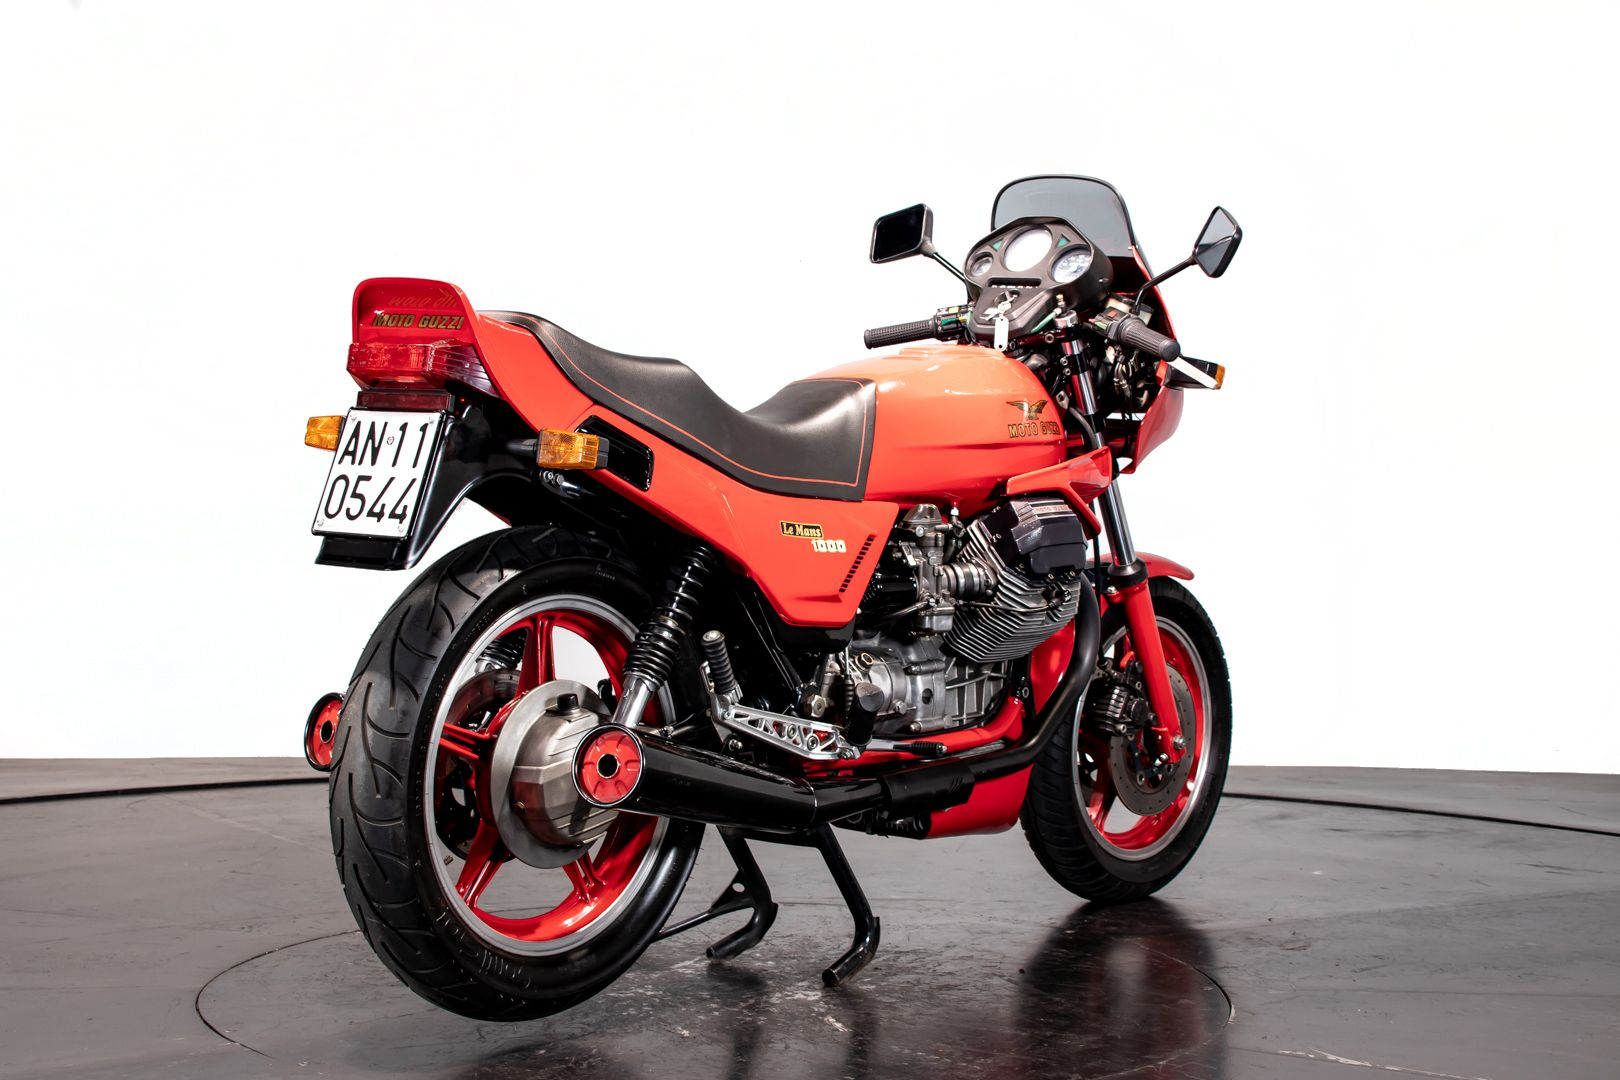 1985 Moto Guzzi le mans 1000 57514